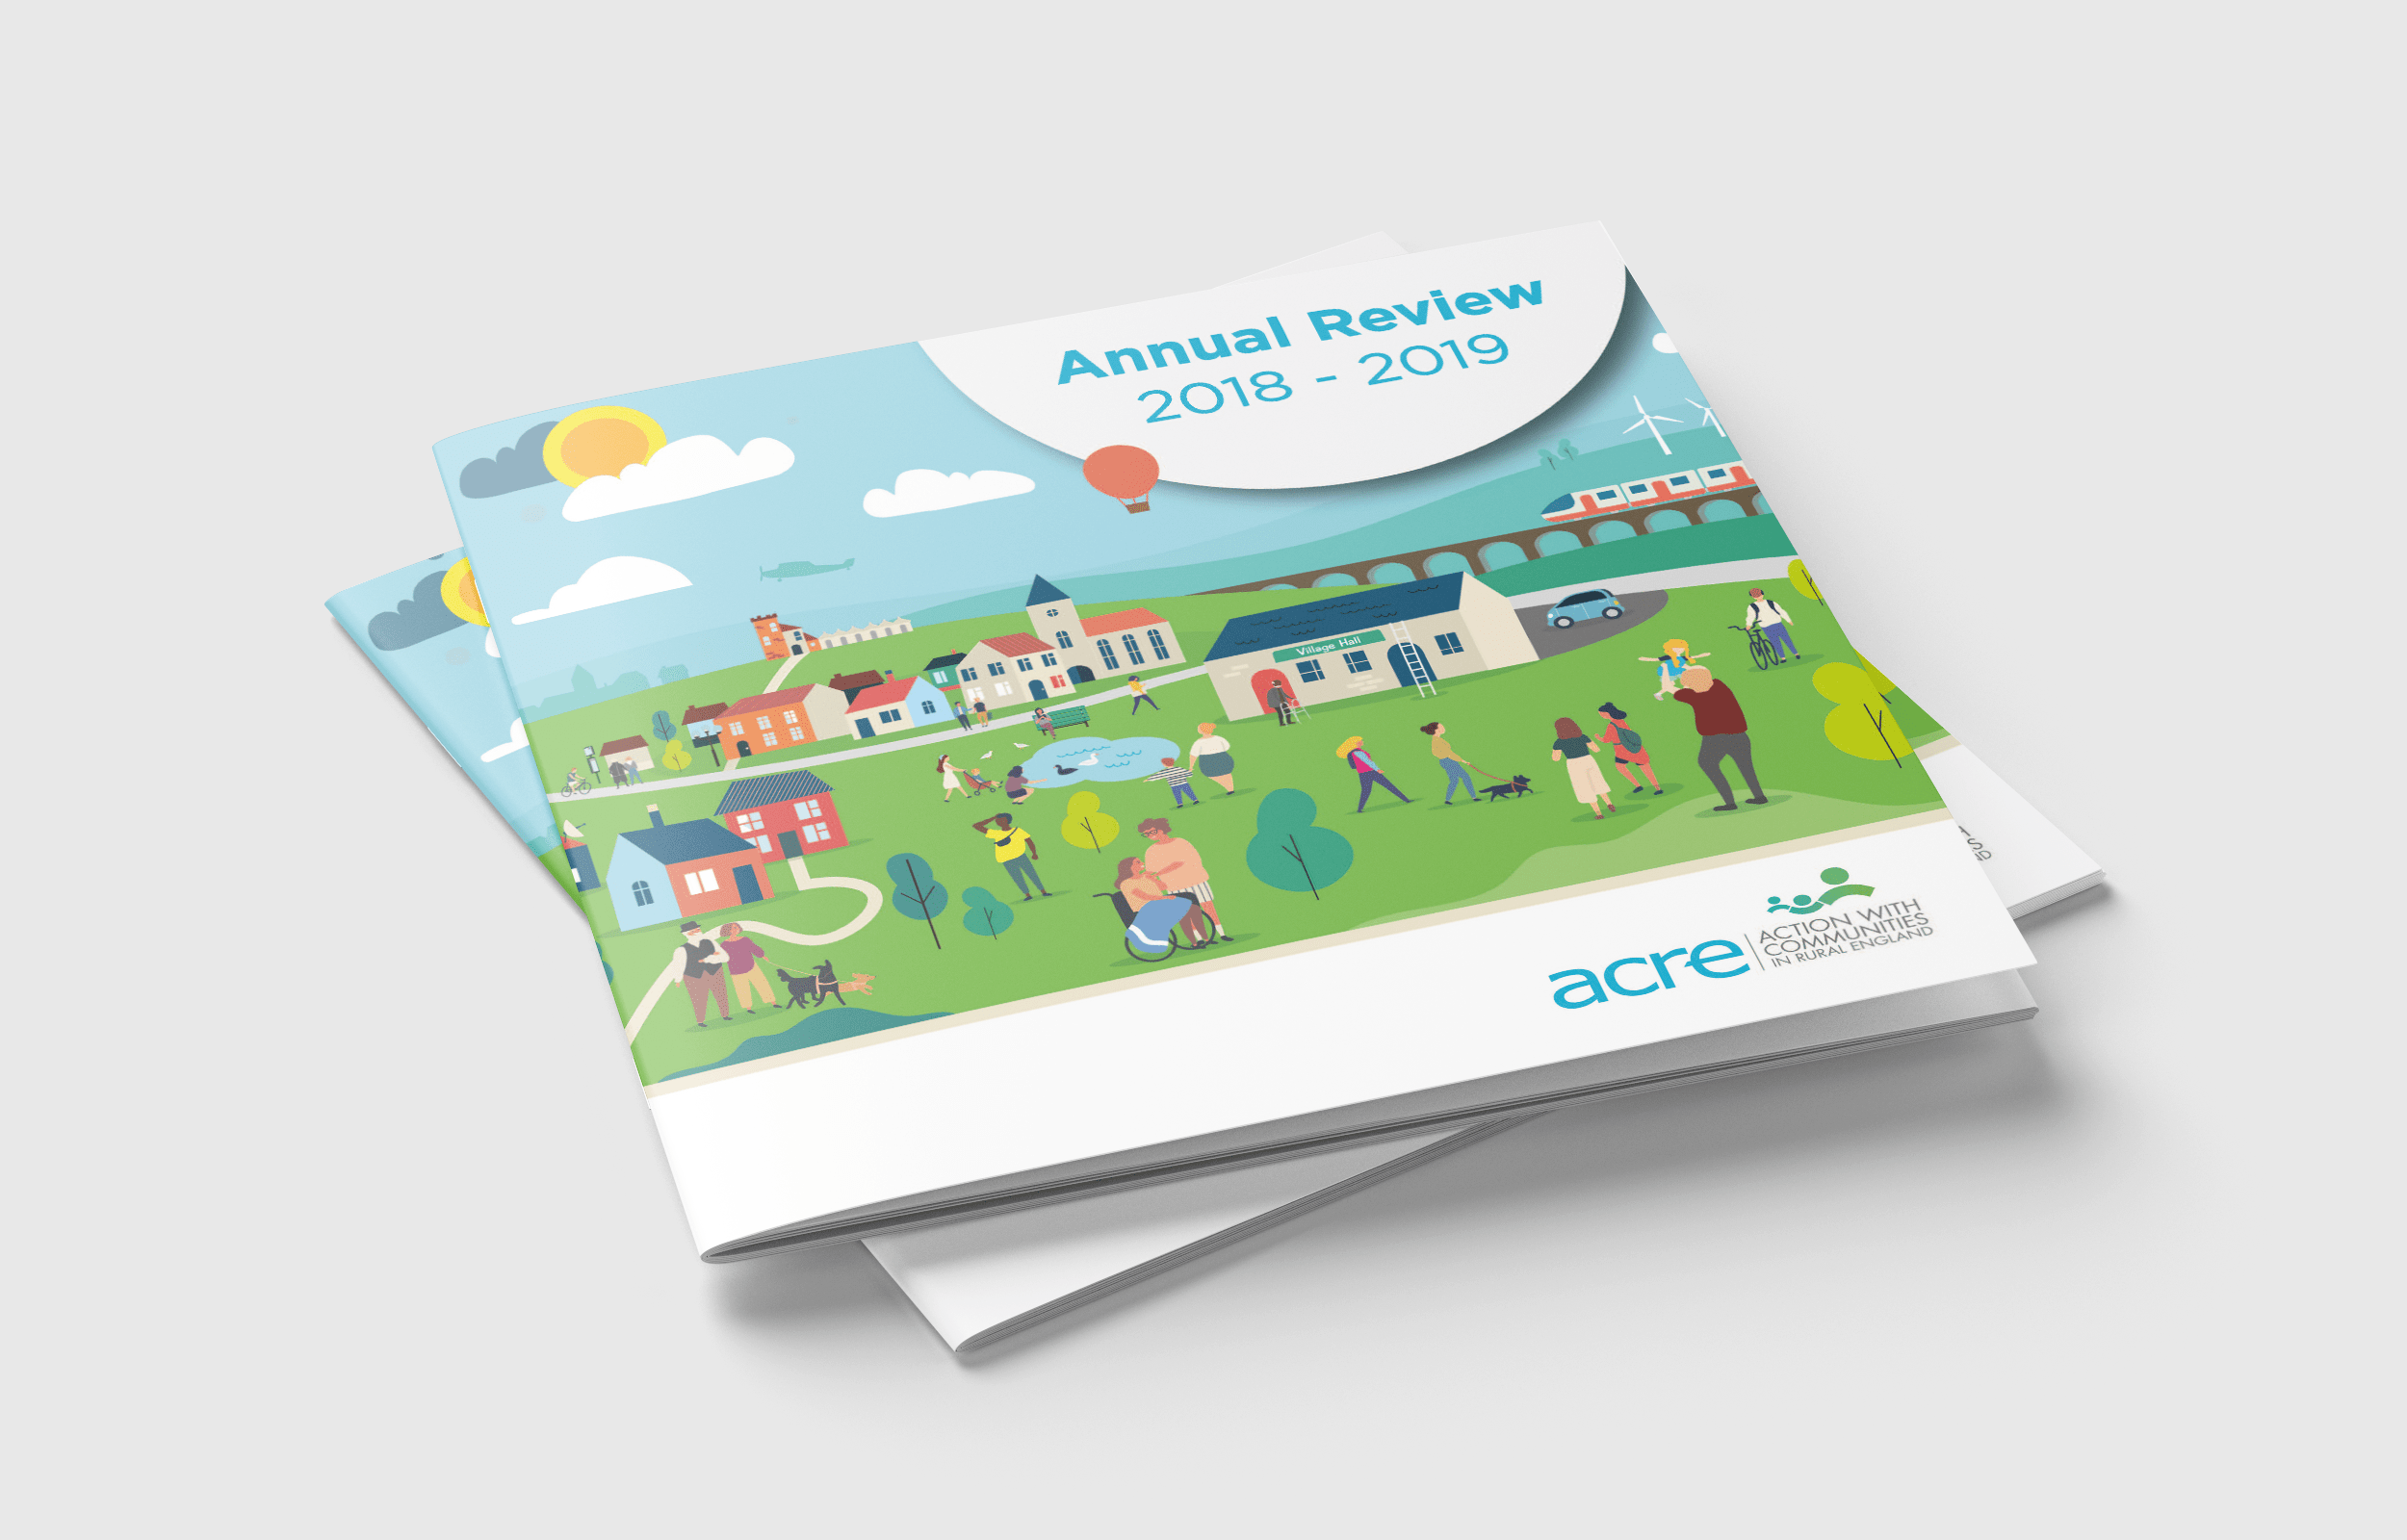 ACRE Annual Review 2018 - 2019 Print Design